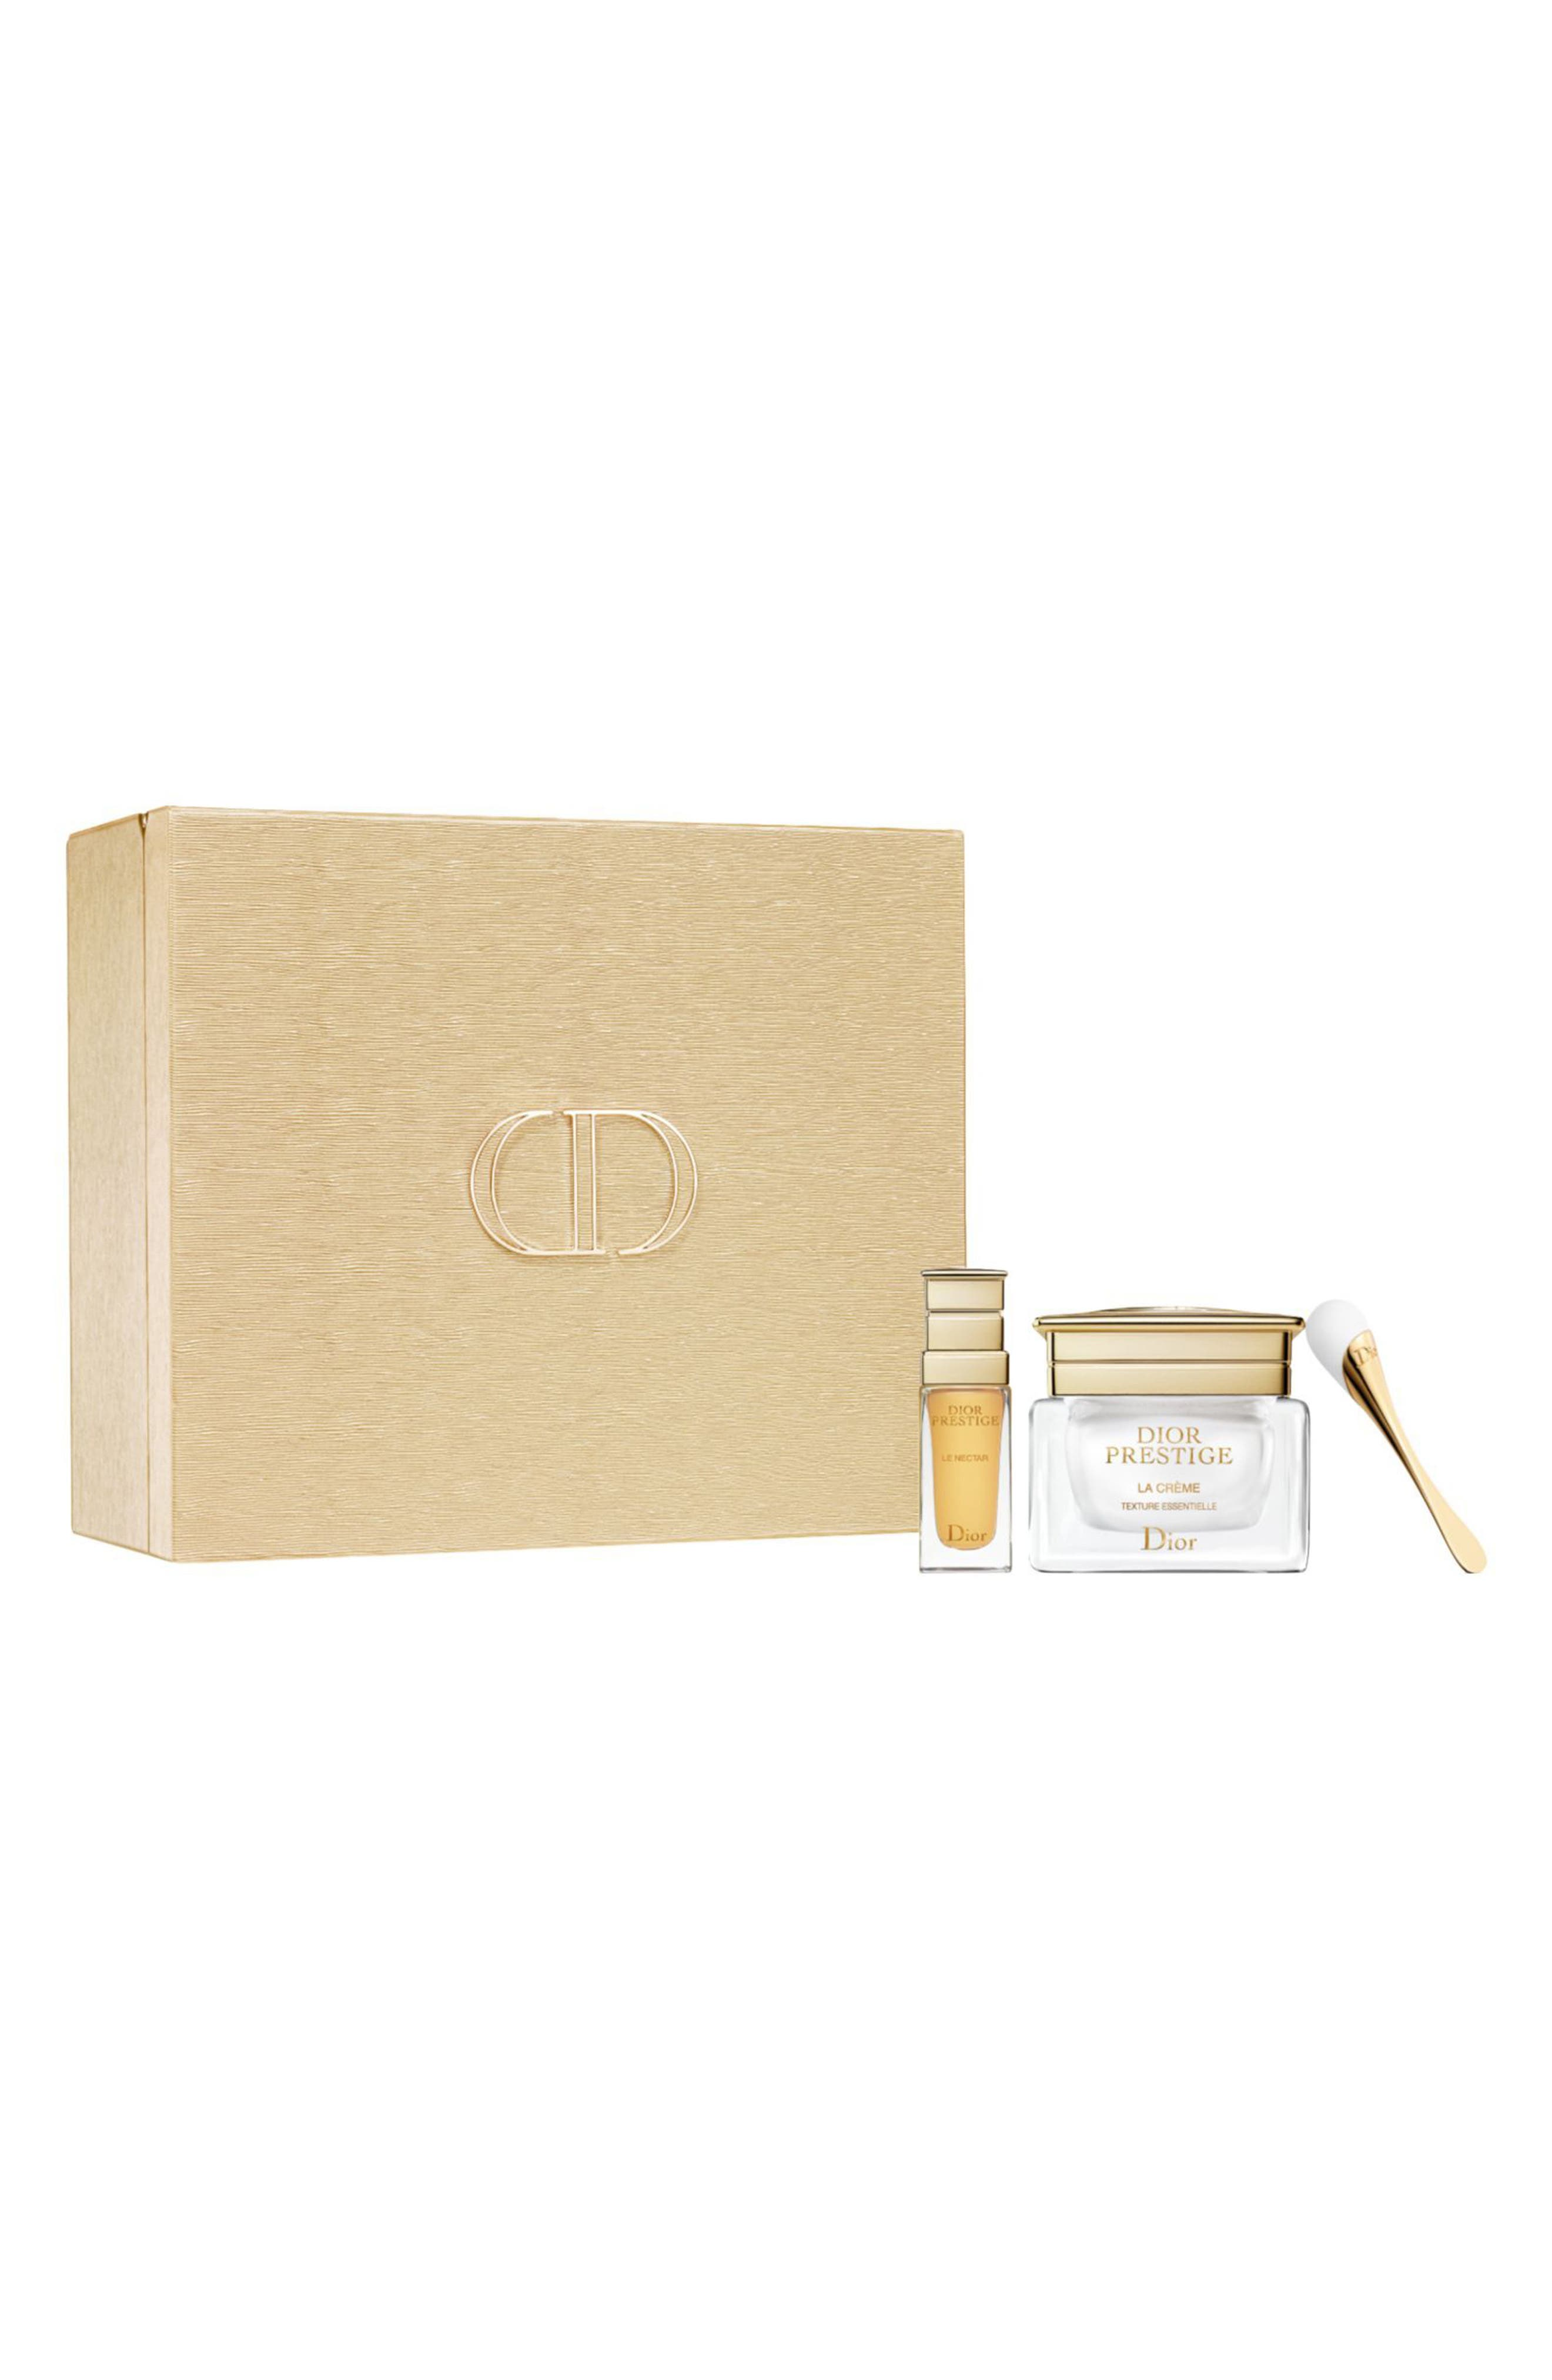 Main Image - Dior Prestige Crème Set ($553 Value)